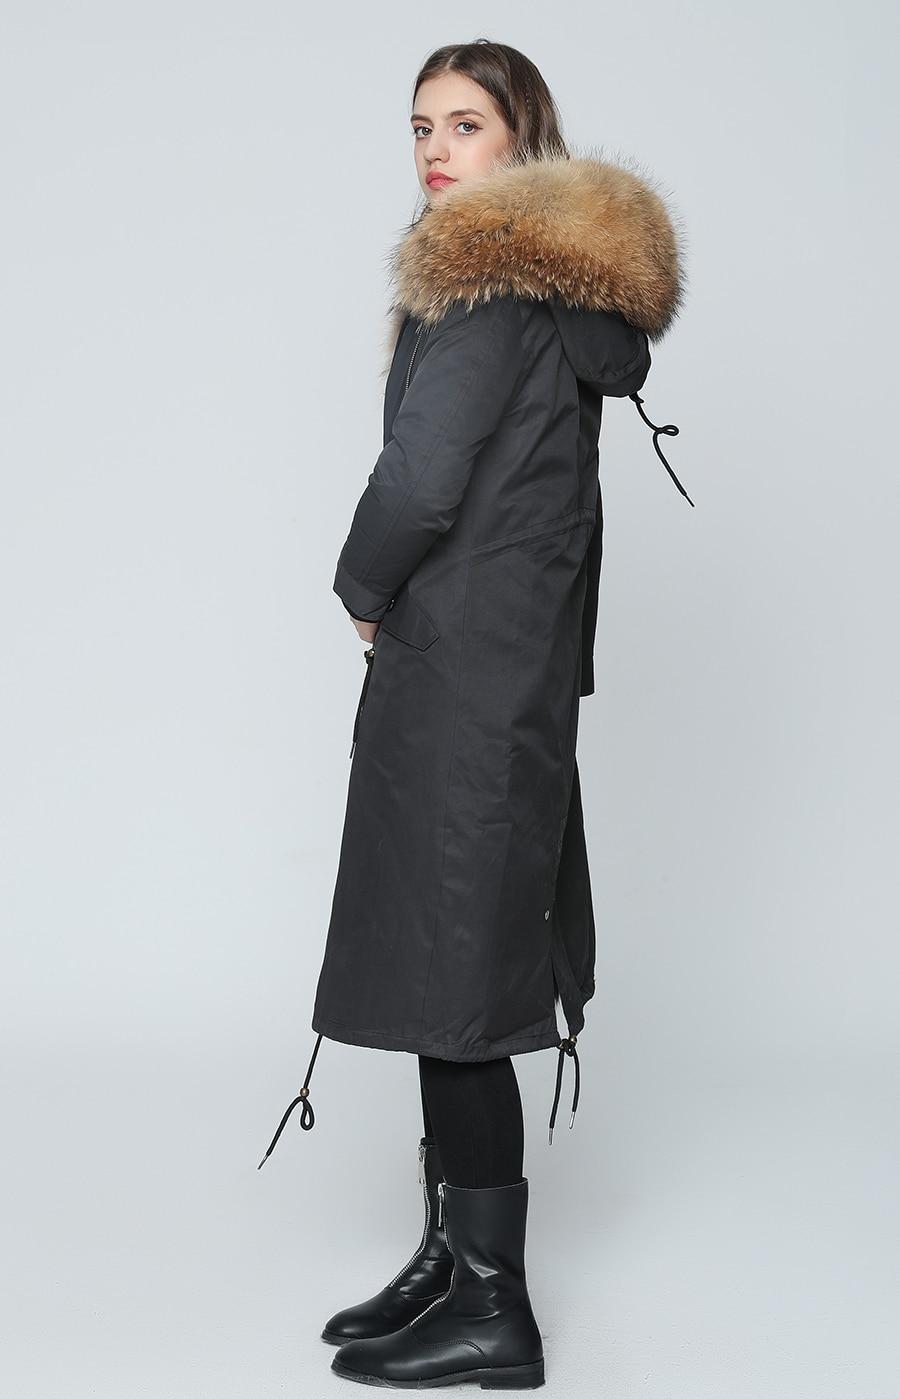 2019 Real Fur Coat Winter Jacket Women Long Parka Waterproof Big Natural Raccoon Fur Collar Hood Thick Warm Real Fox Fur Liner 73